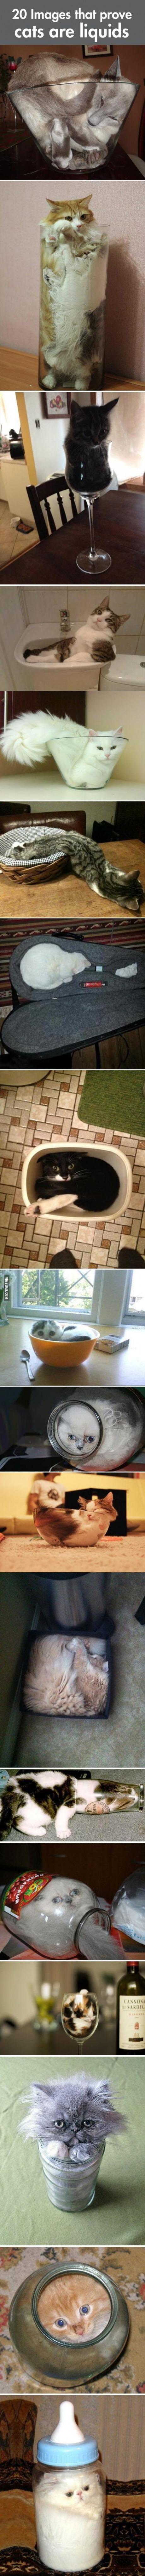 Definitive Proof That Cats Are Basically Liquids... | DailyFailCenter